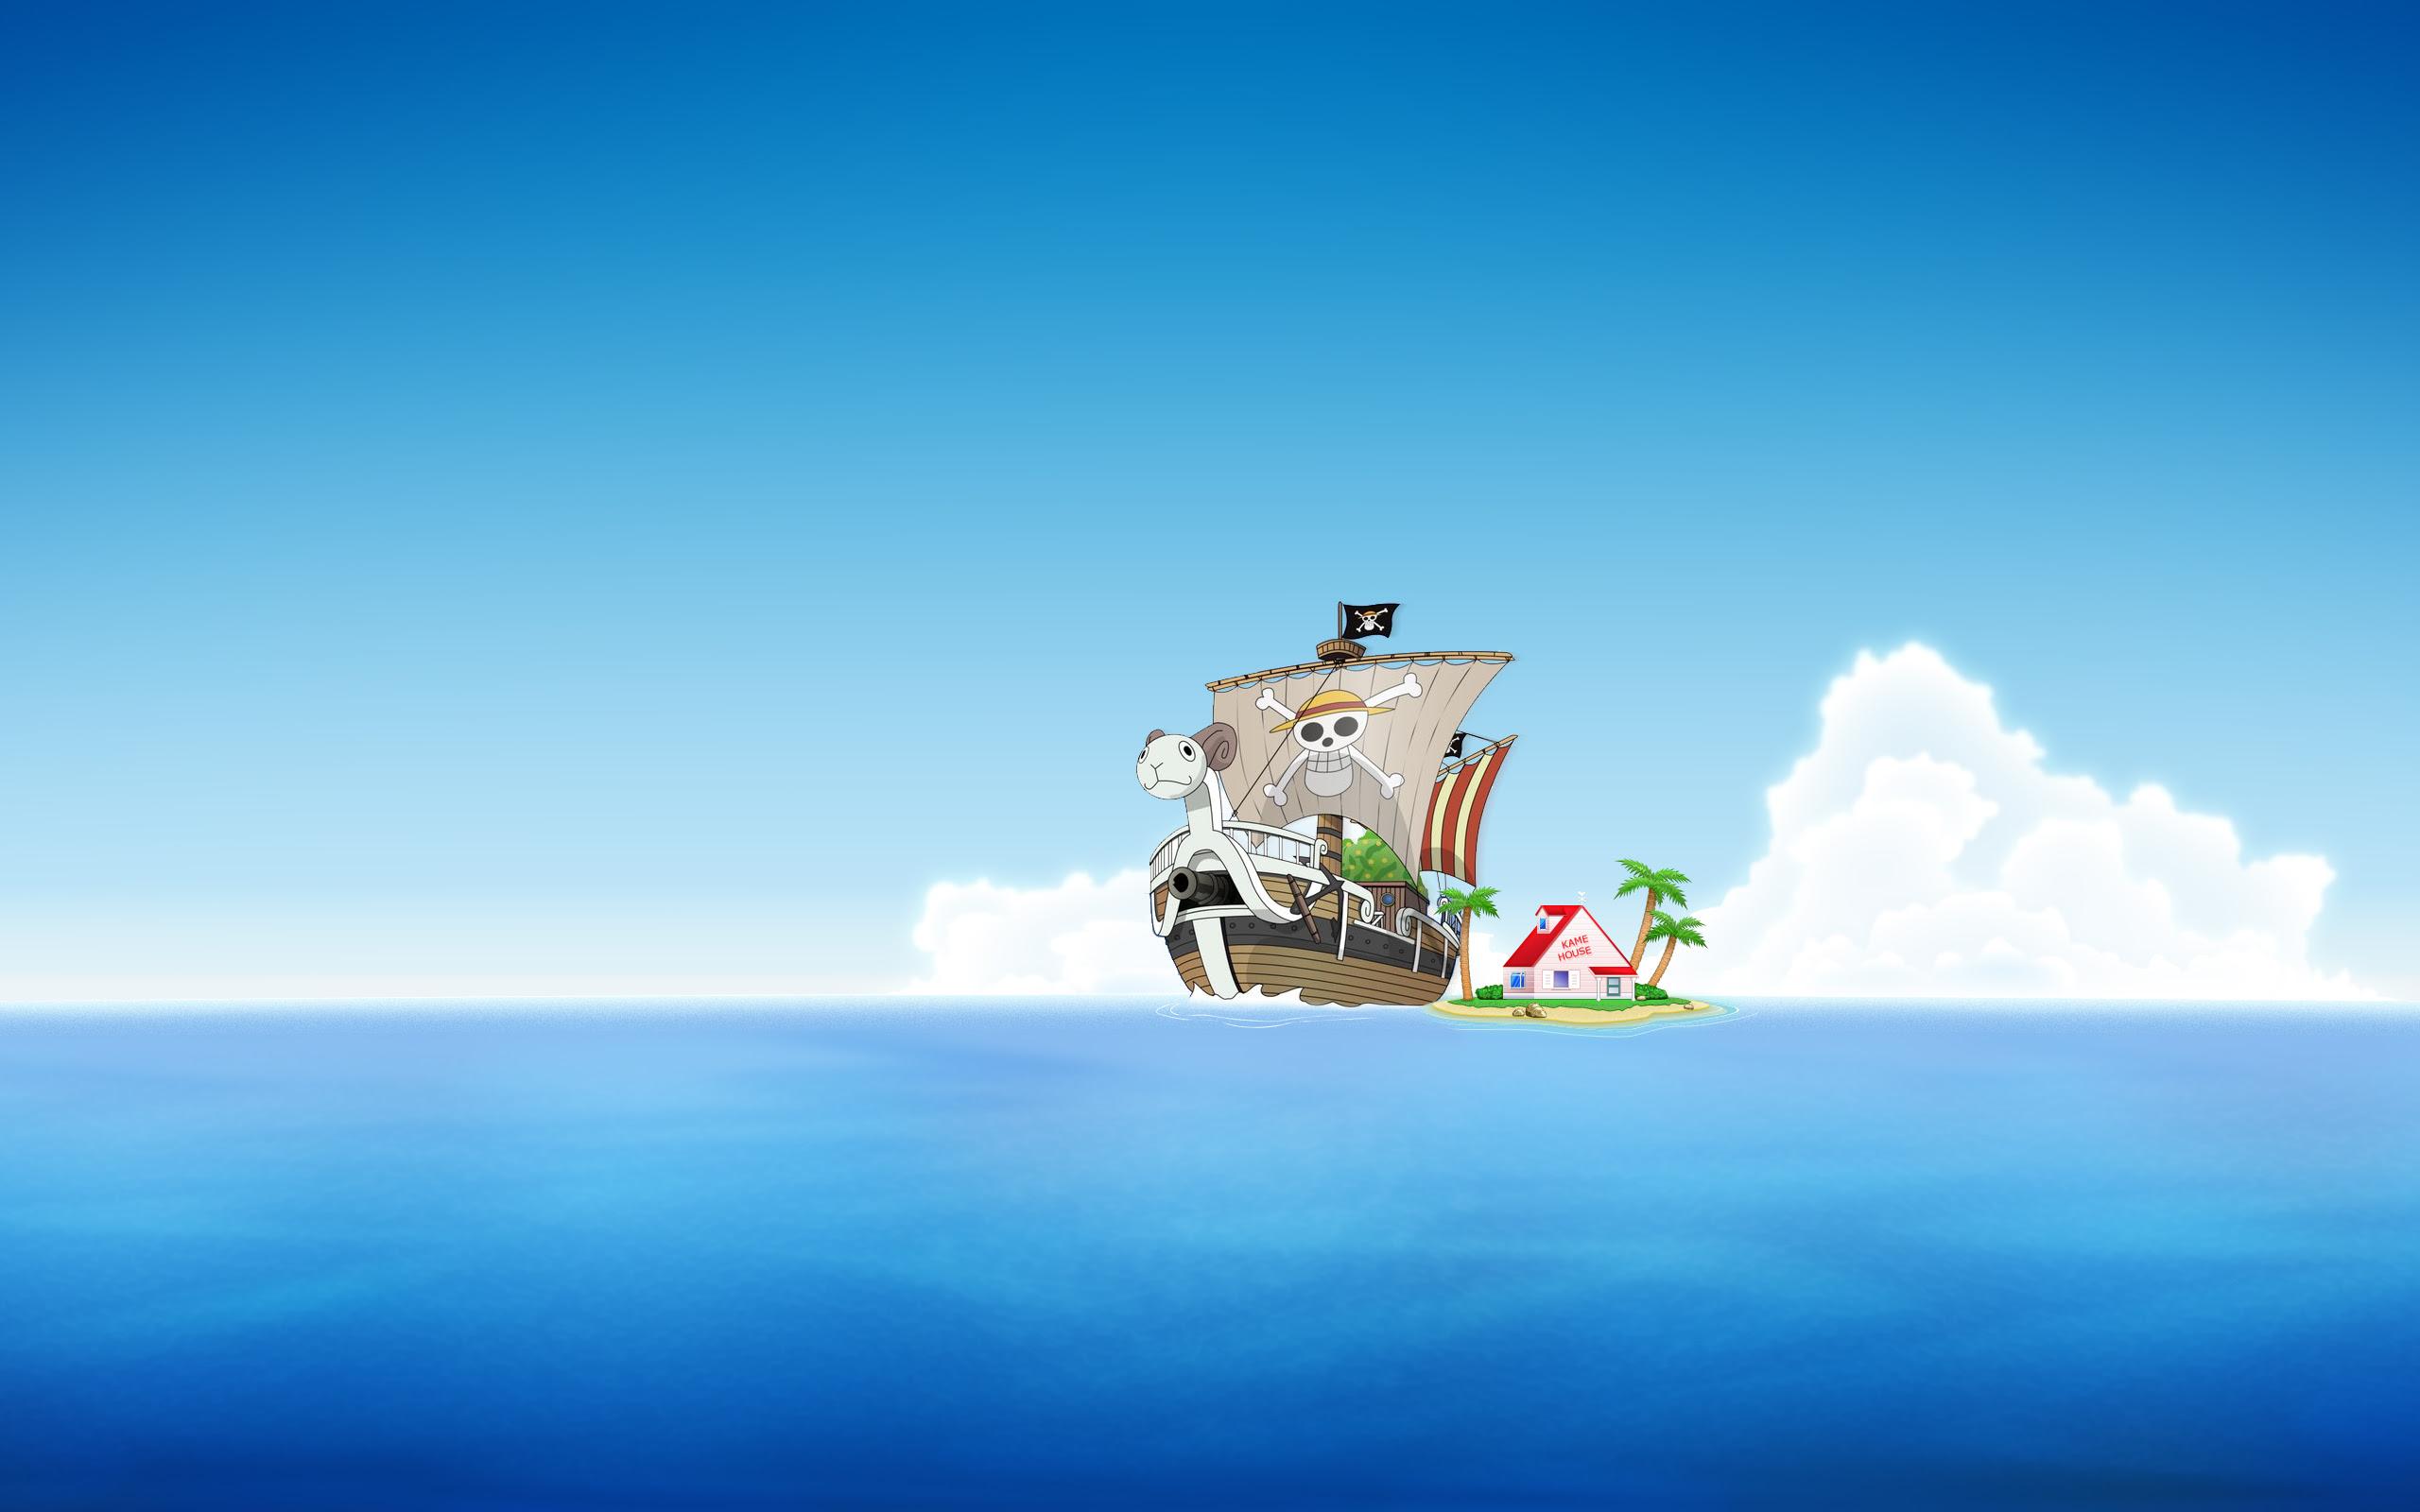 Wallpaper Pemandangan: One Piece Going Merry Wallpaper